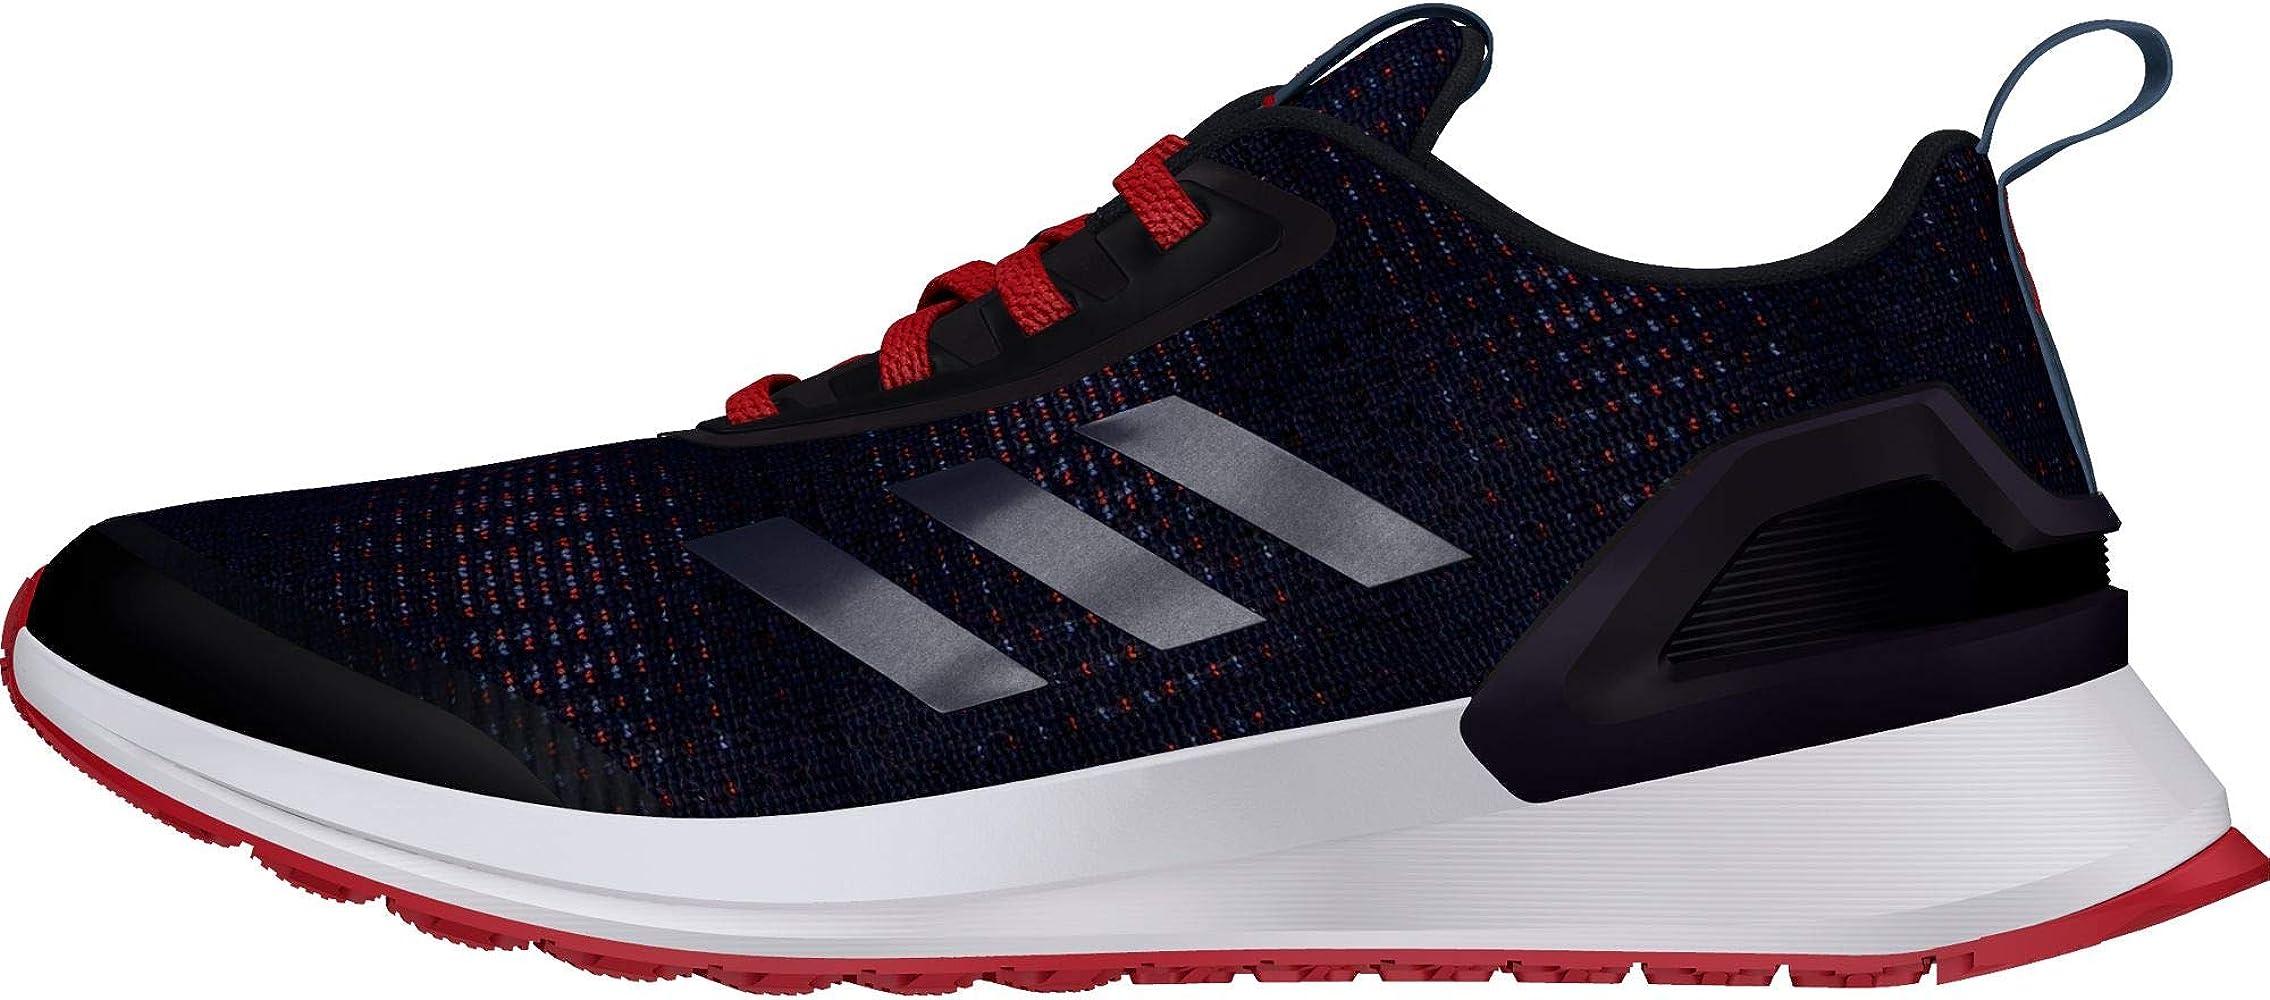 Adidas RapidaRun X Knit J, Zapatillas de Trail Running Unisex ...